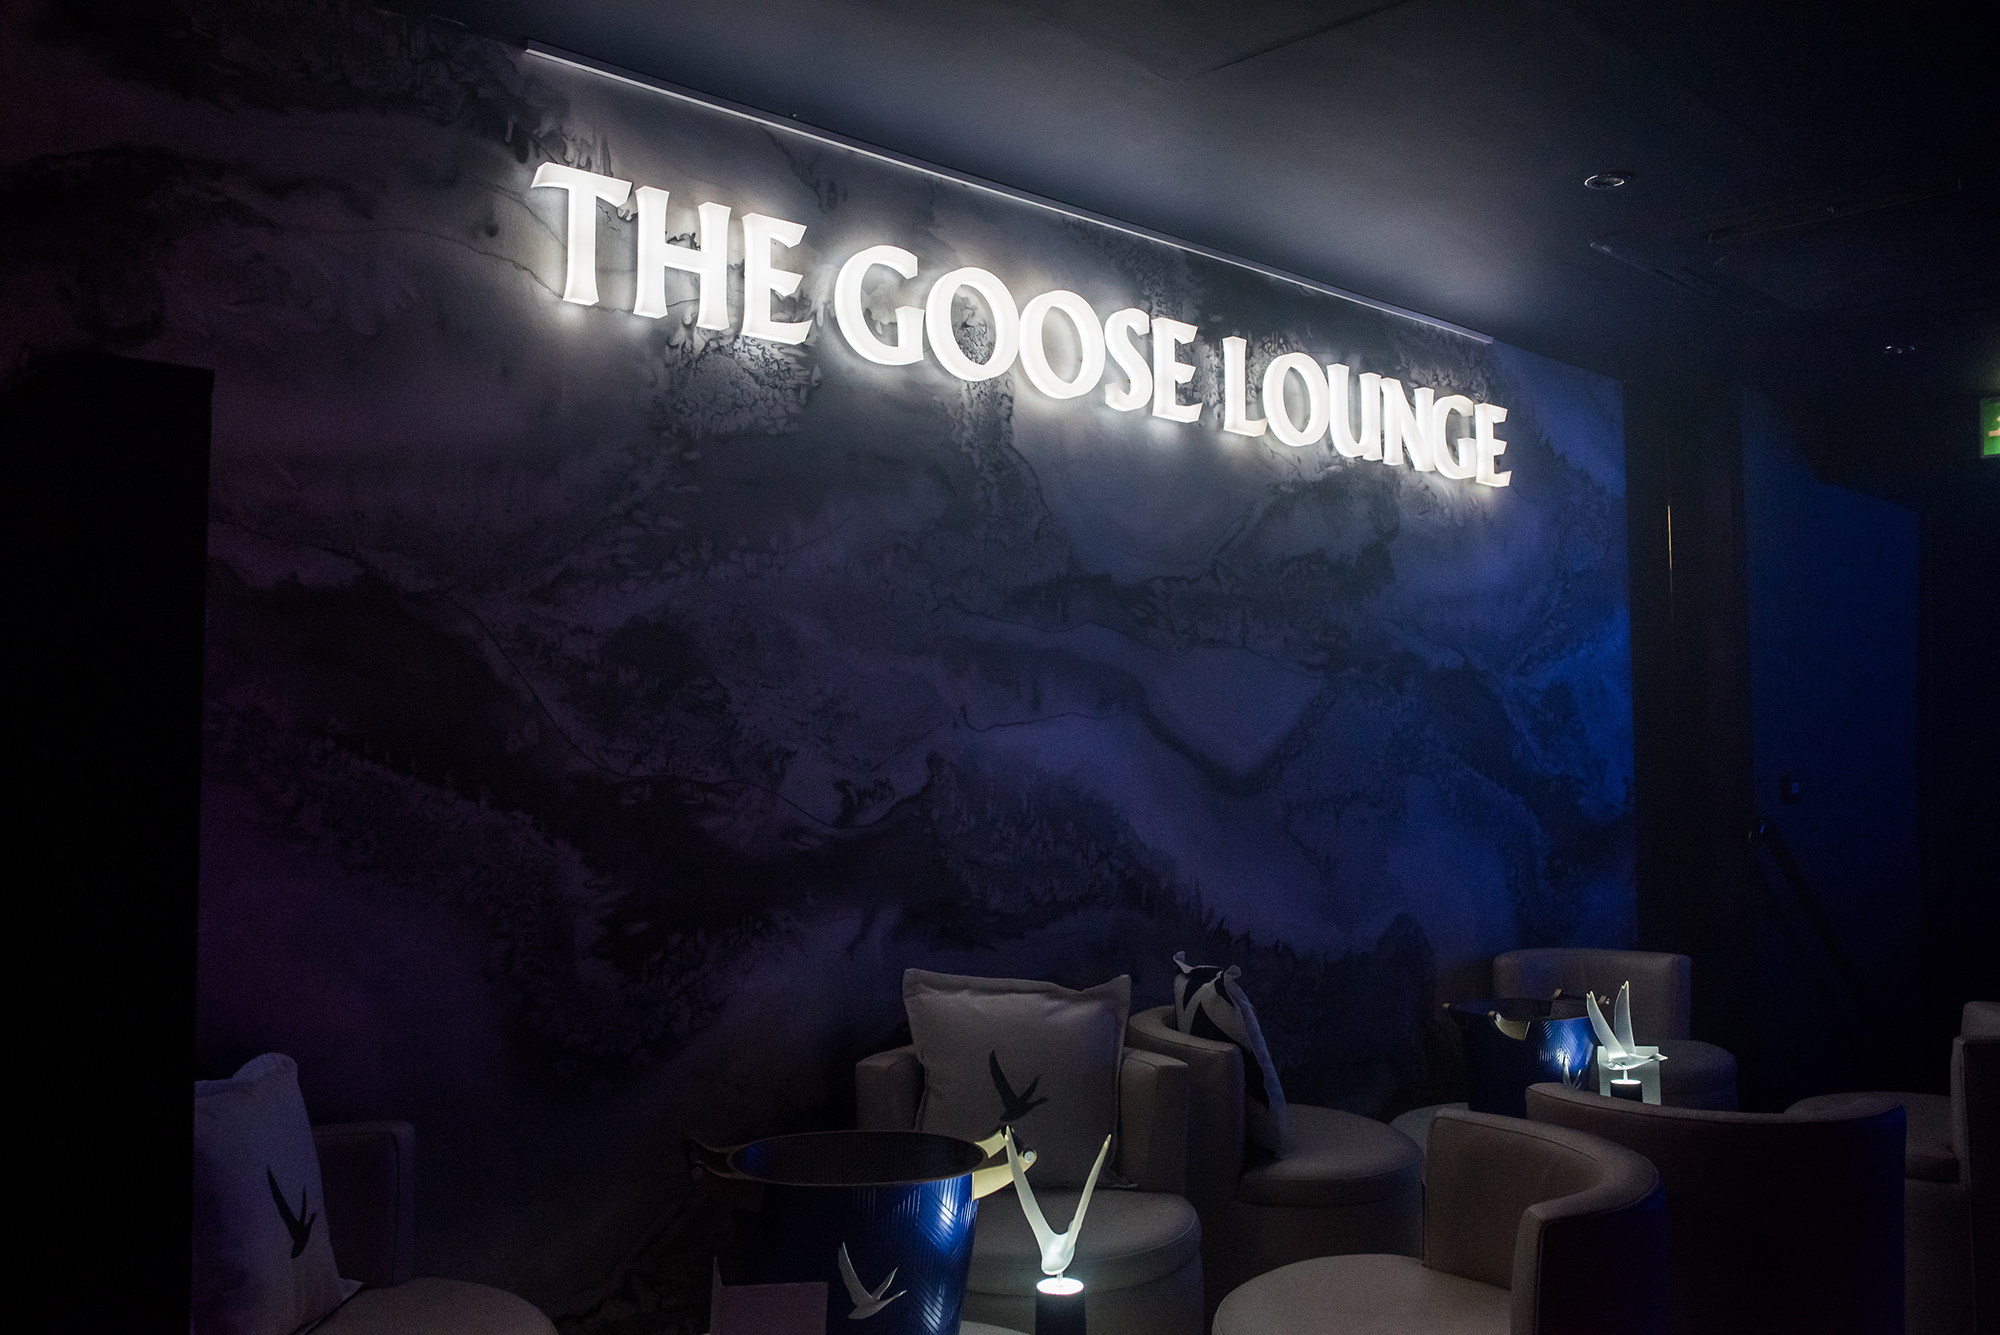 the_goose_lounge_07.jpg